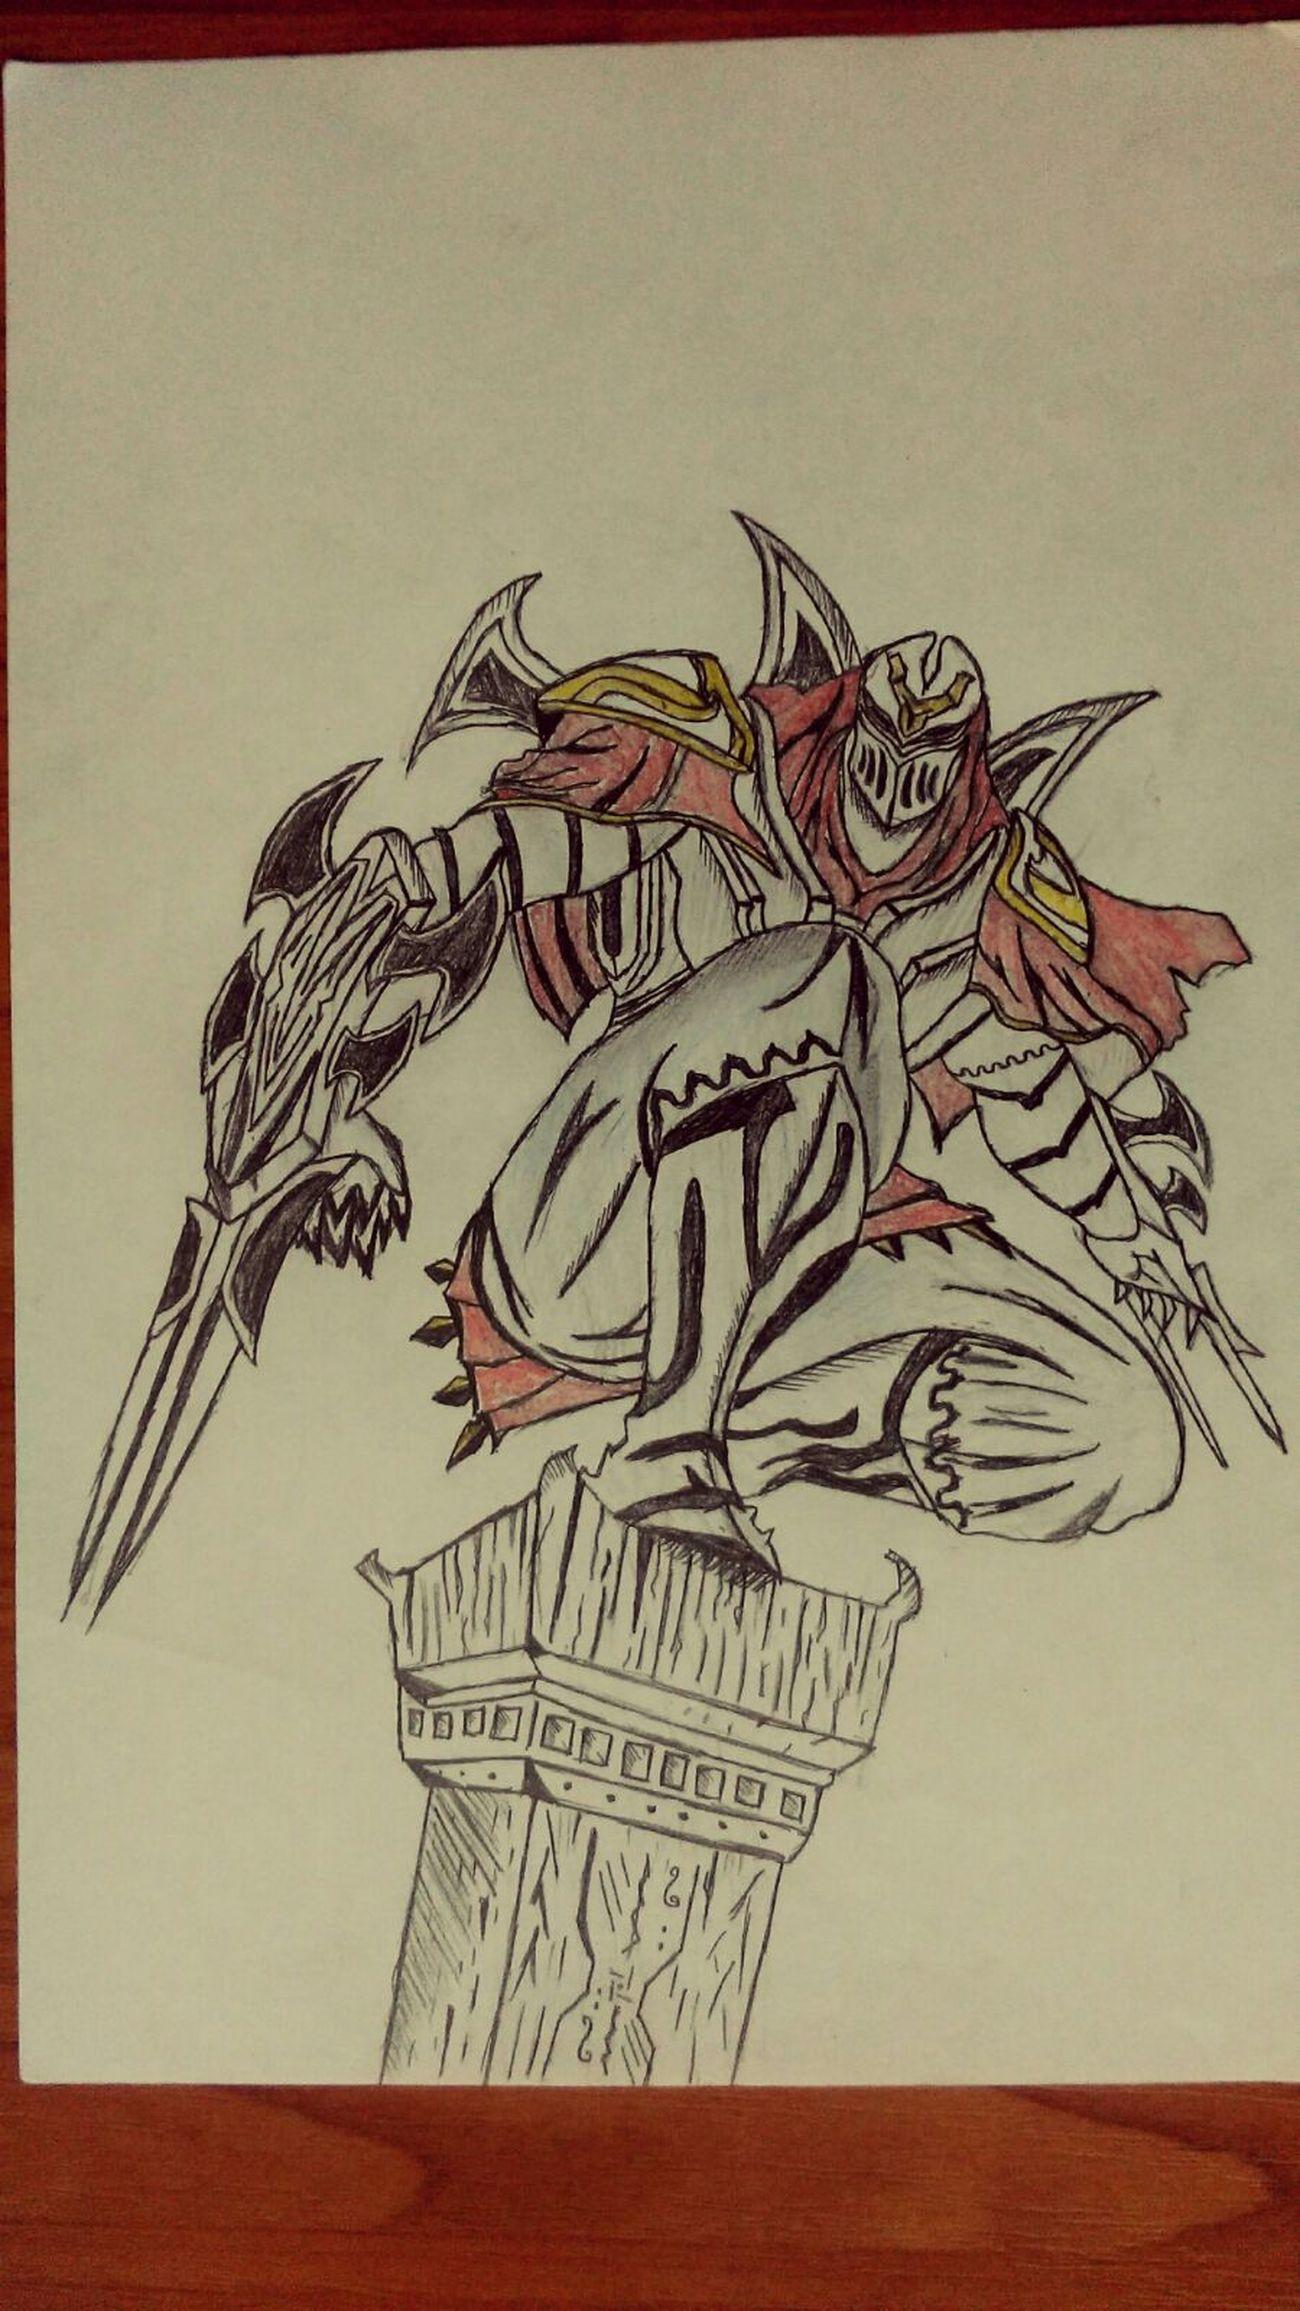 Zed Art, Drawing, Creativity Pencil Drawing League Of Legends Art Pencil Ninja Shadow